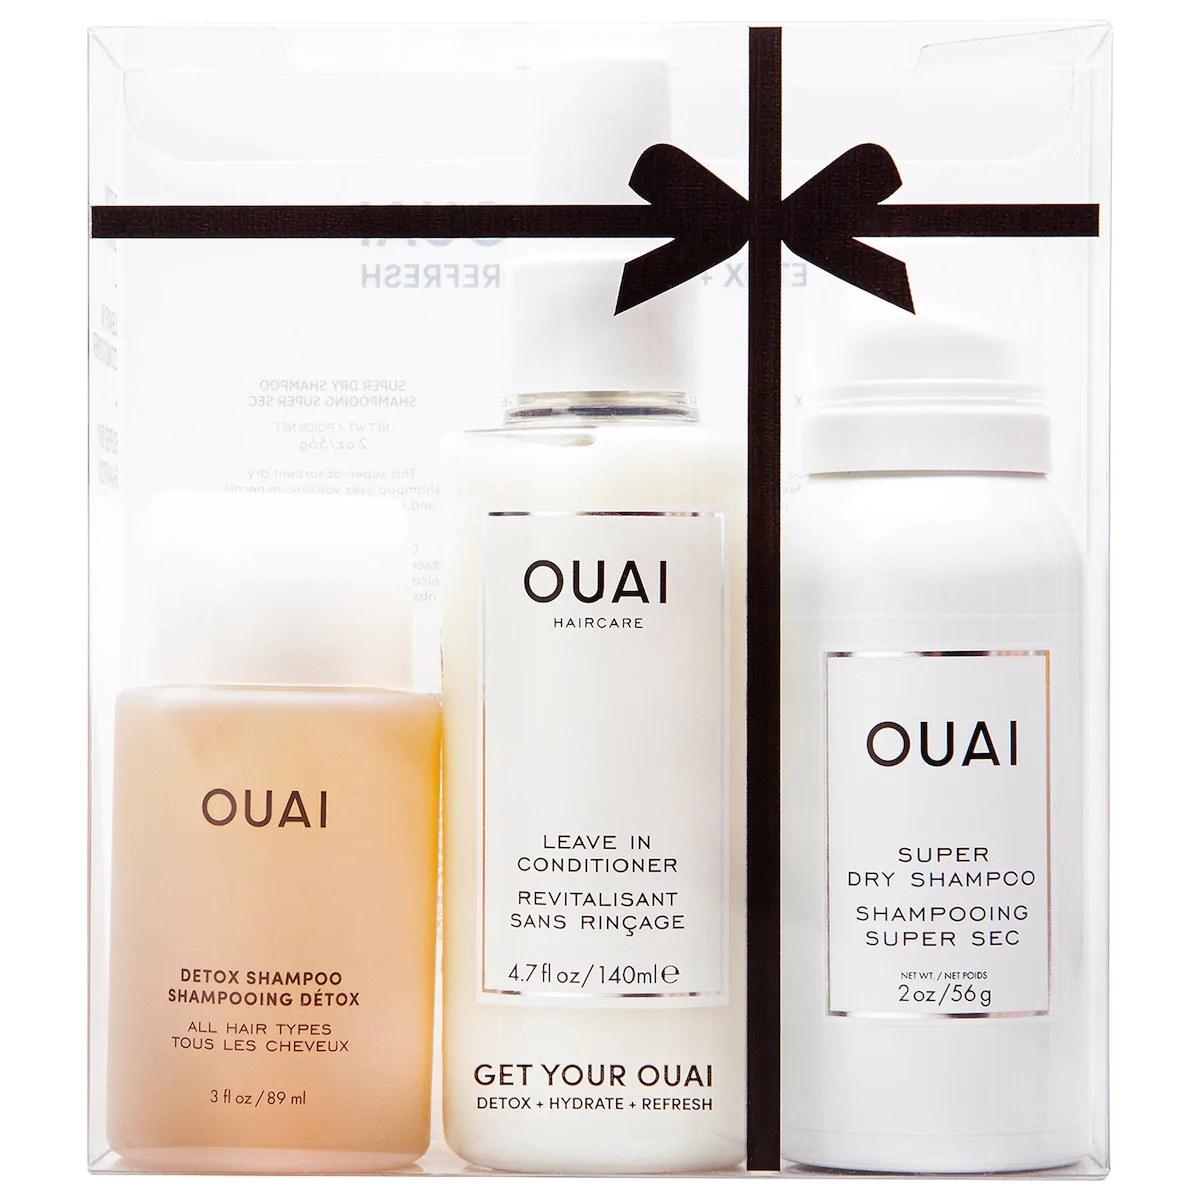 The three-piece OUAI set